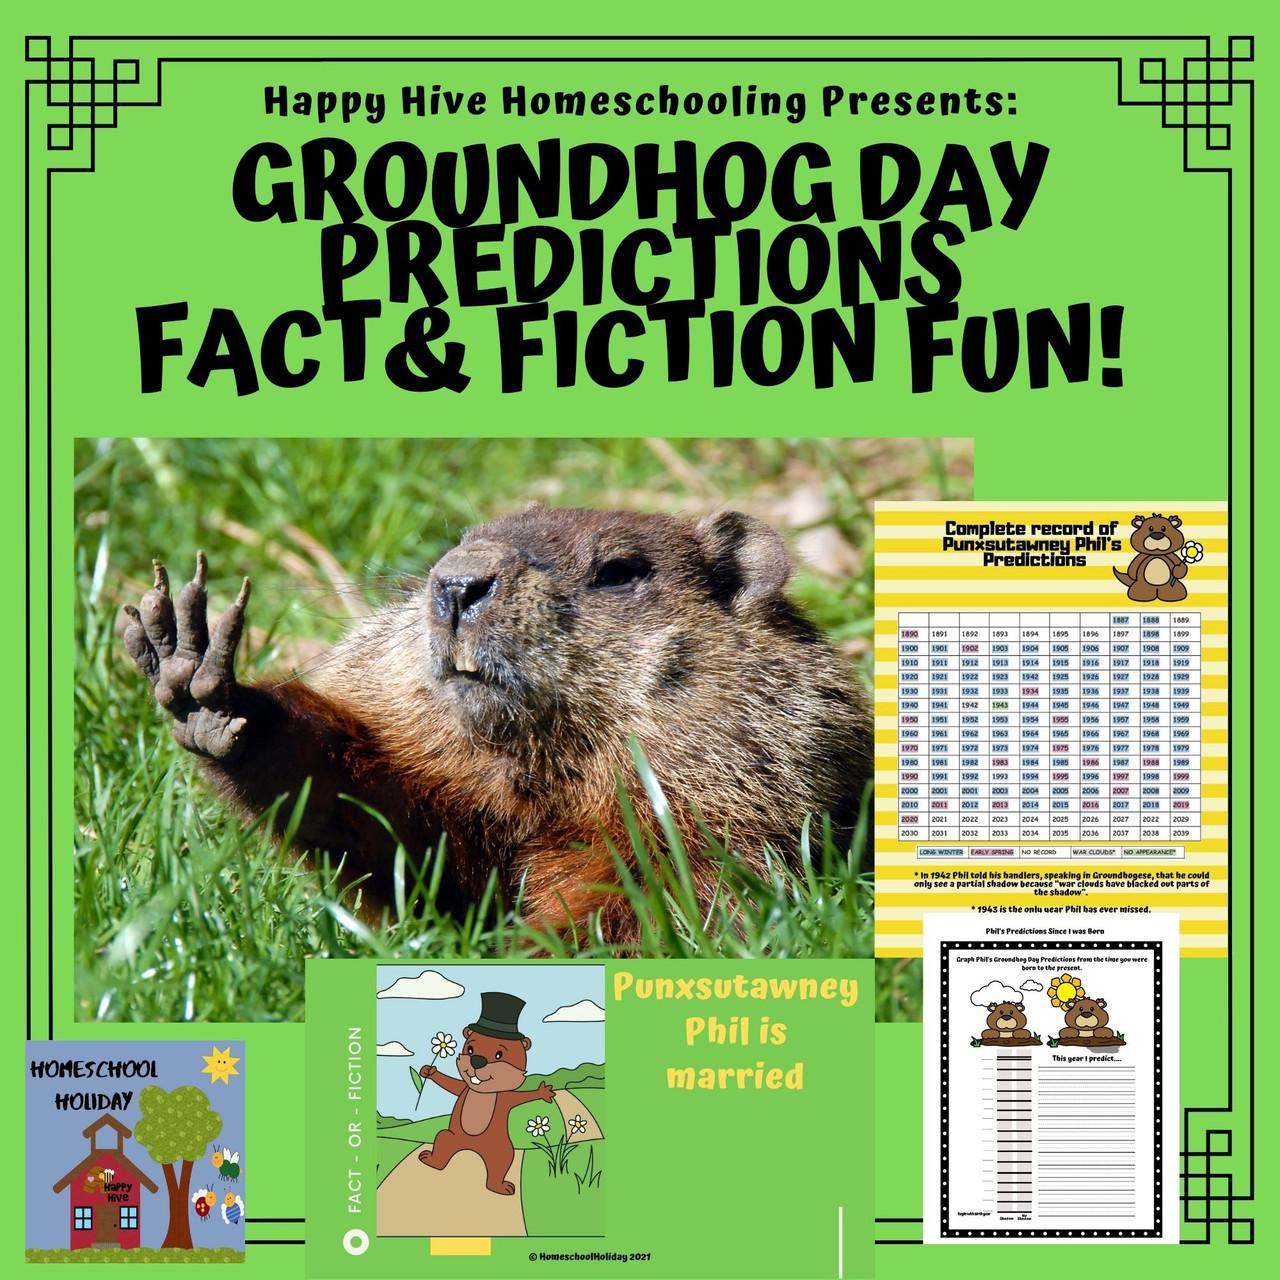 Groundhog Day Groundhog Prediction \u0026 Fun Facts Presentation Activities  Google Slides - Amped Up Learning [ 1280 x 1280 Pixel ]